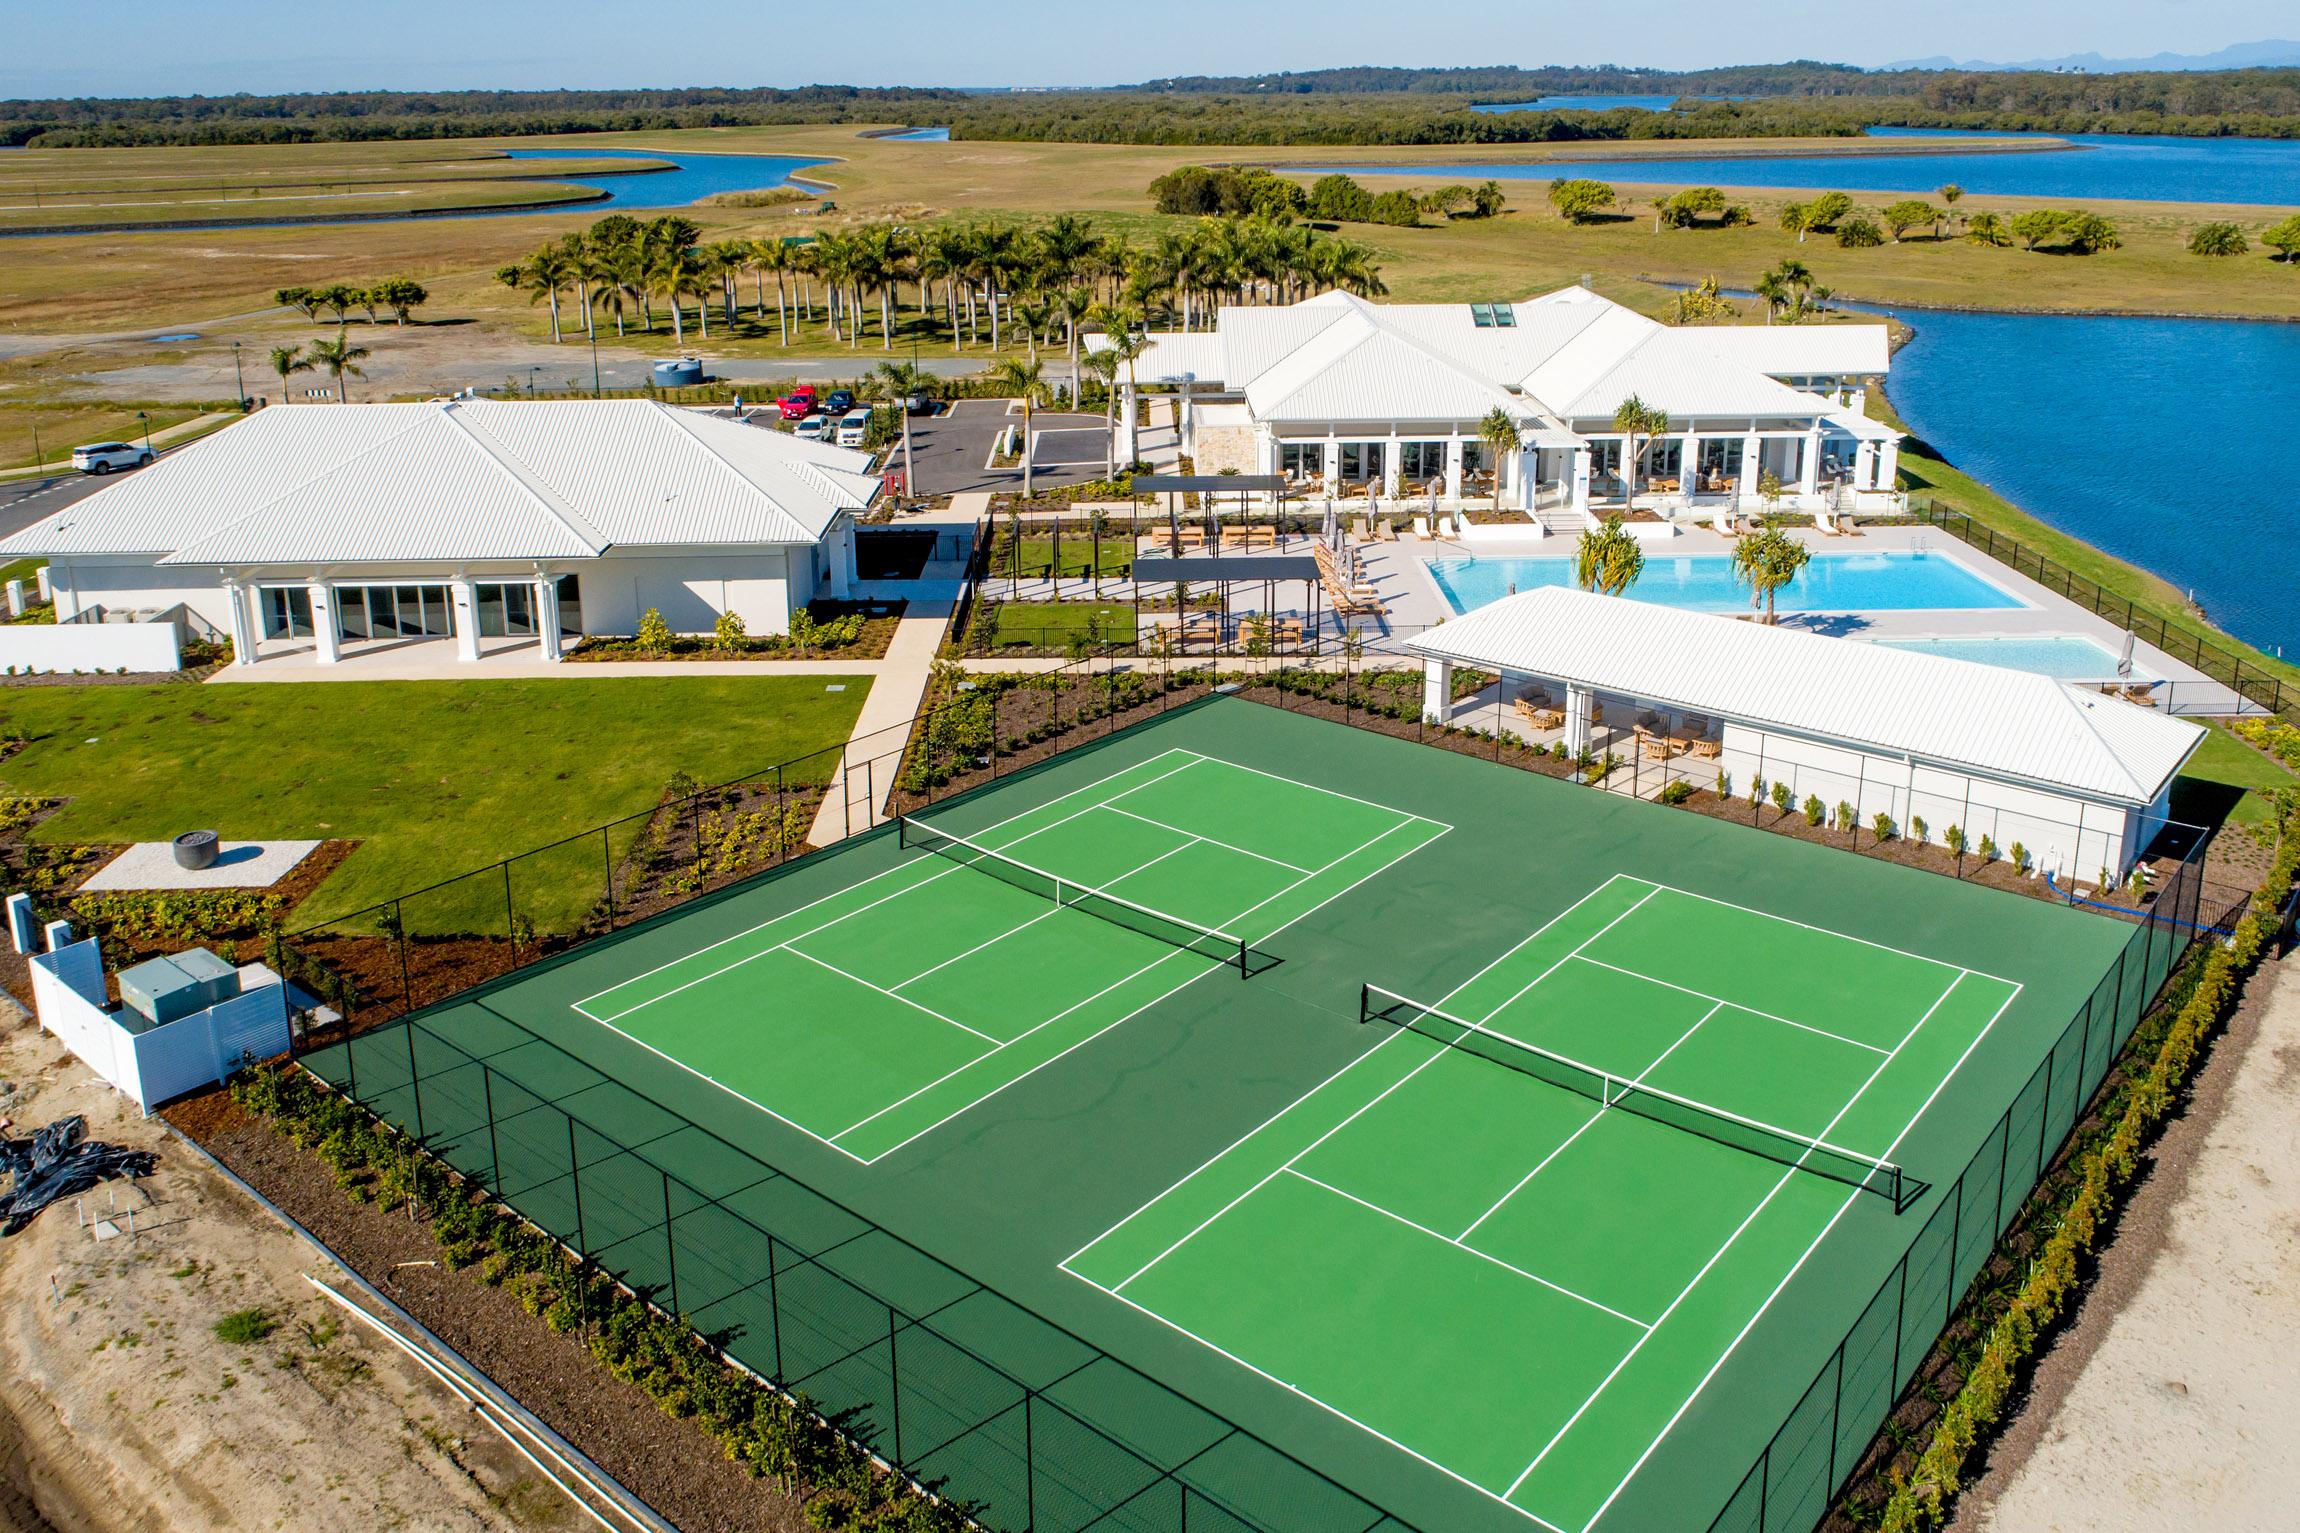 Residents' Leisure Club - Calypso Bay